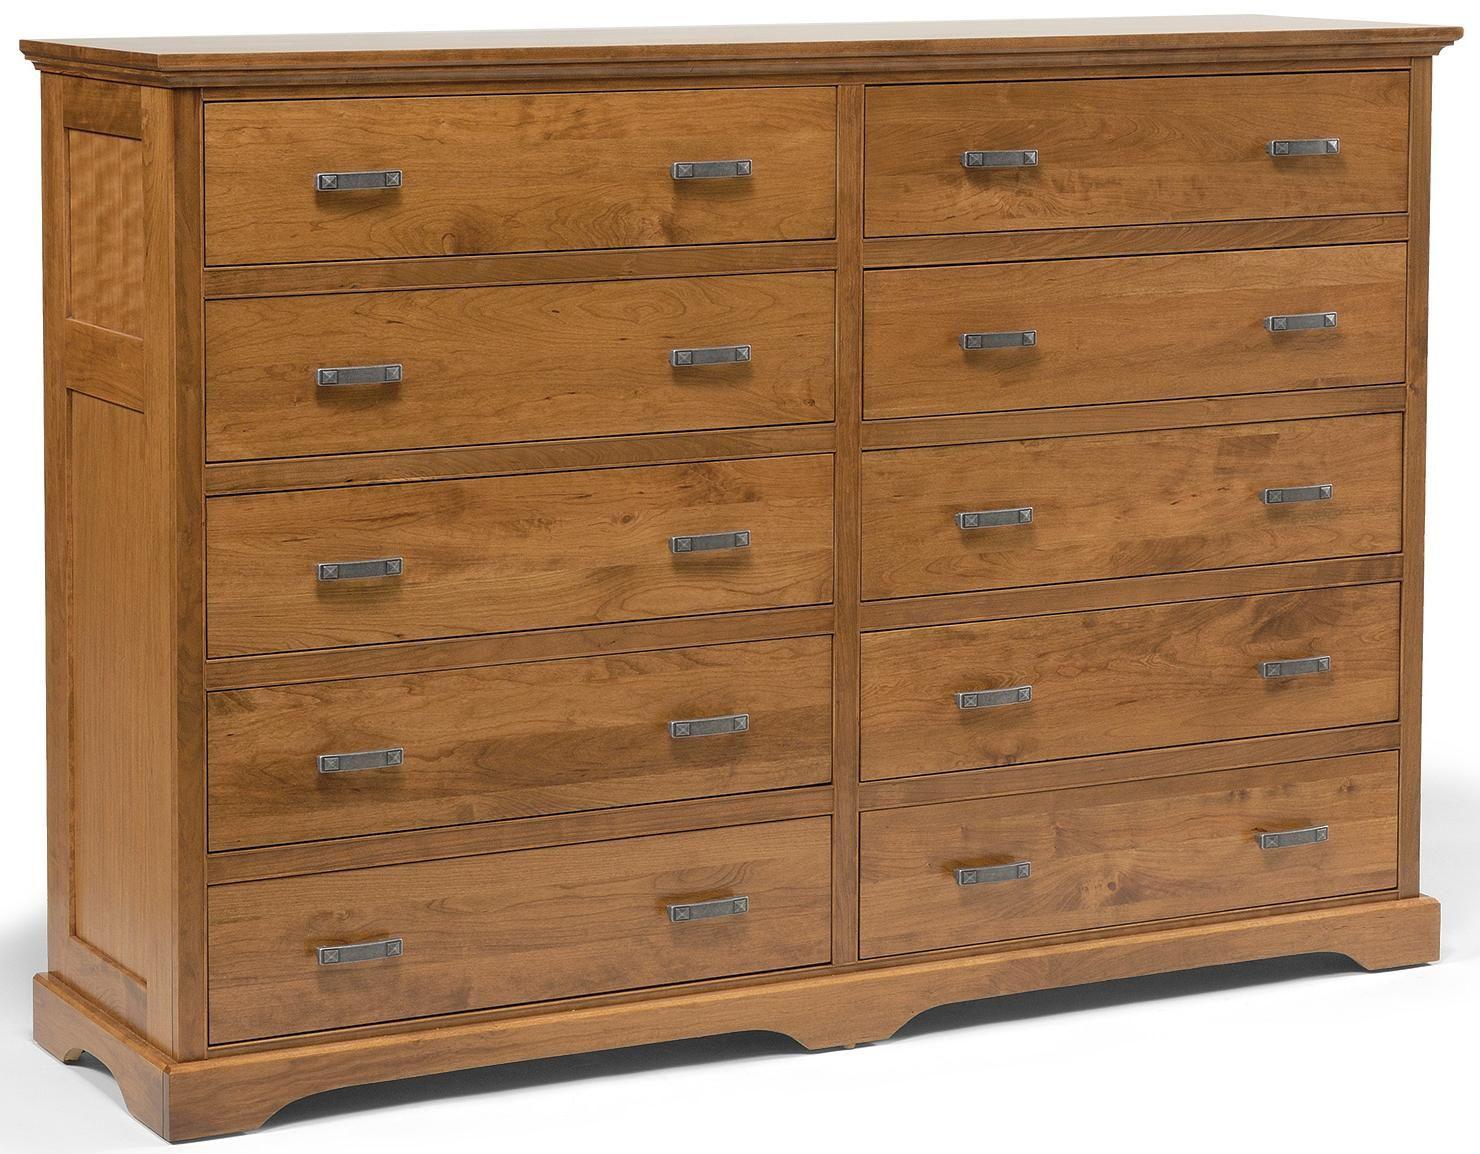 10 Drawer Double Dresser Modern Dresser Dresser Dresser Drawers